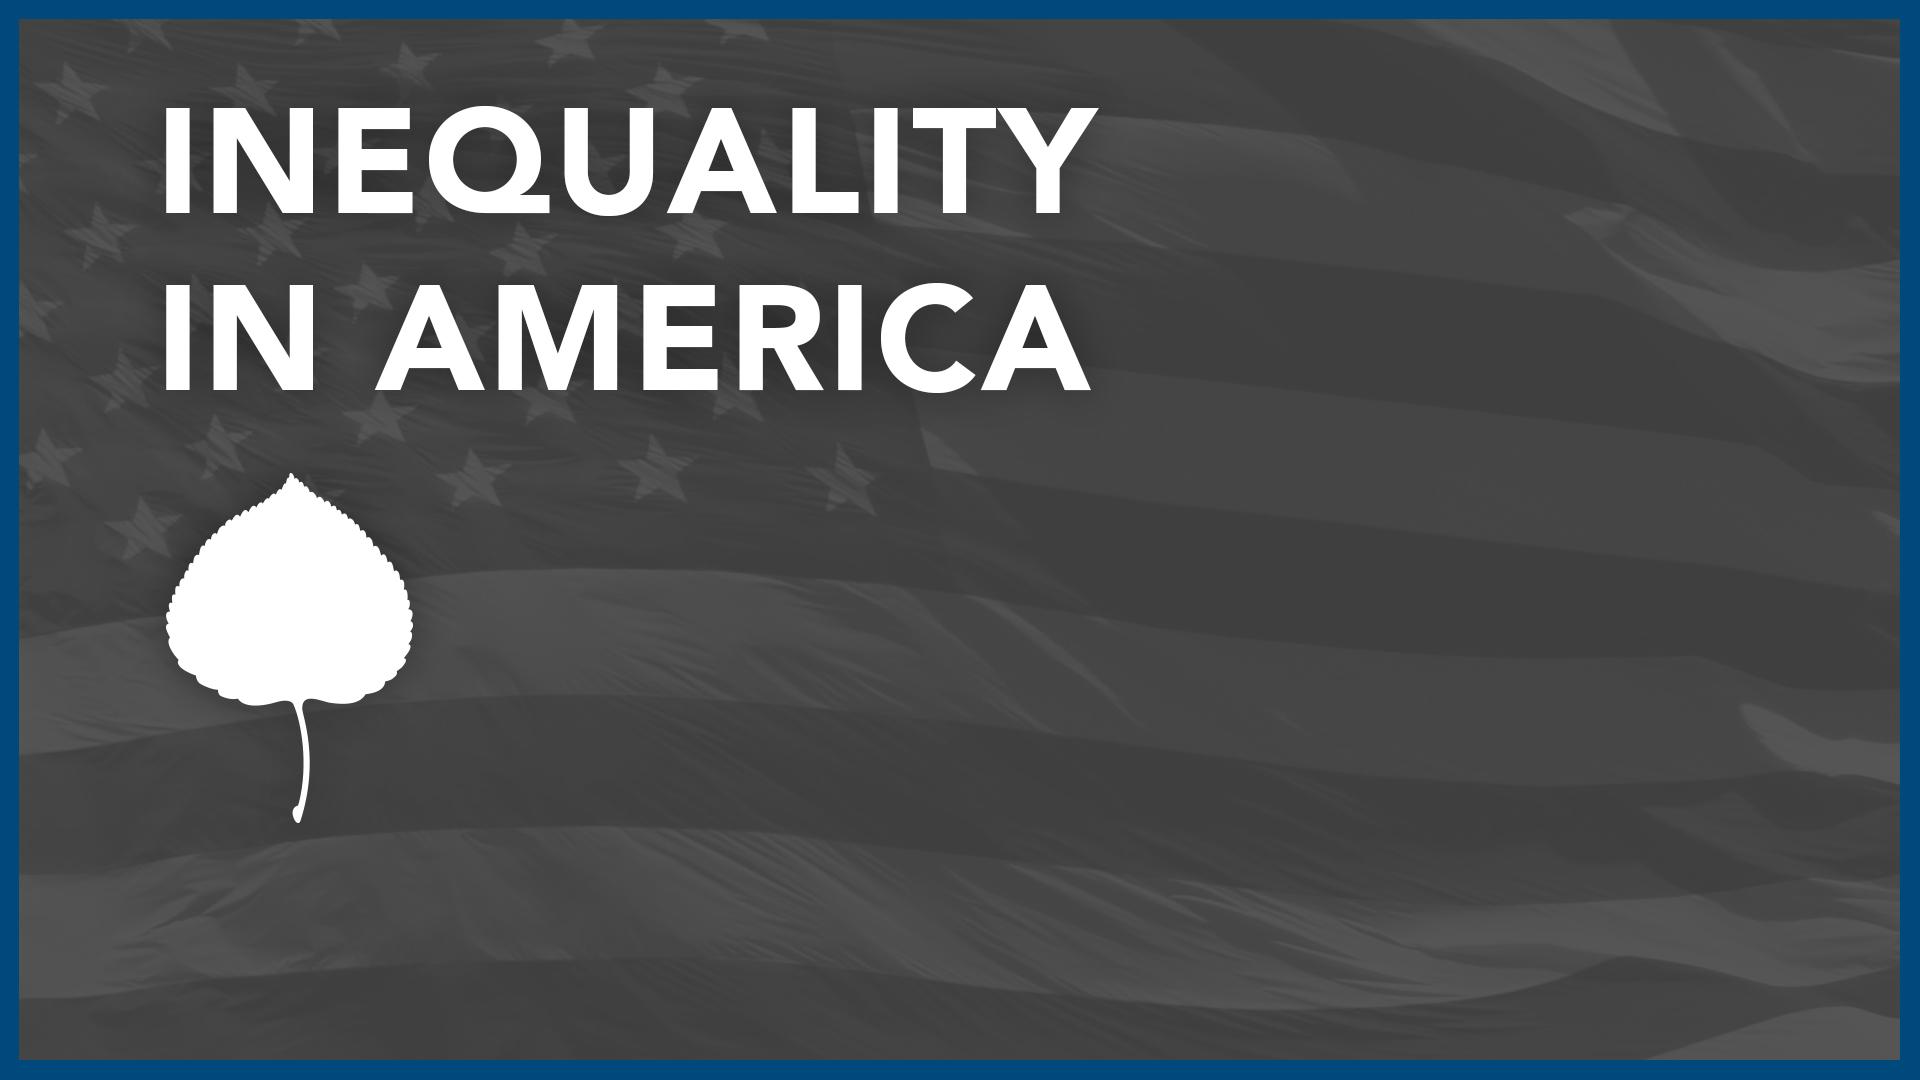 How Do You Define Inequality?